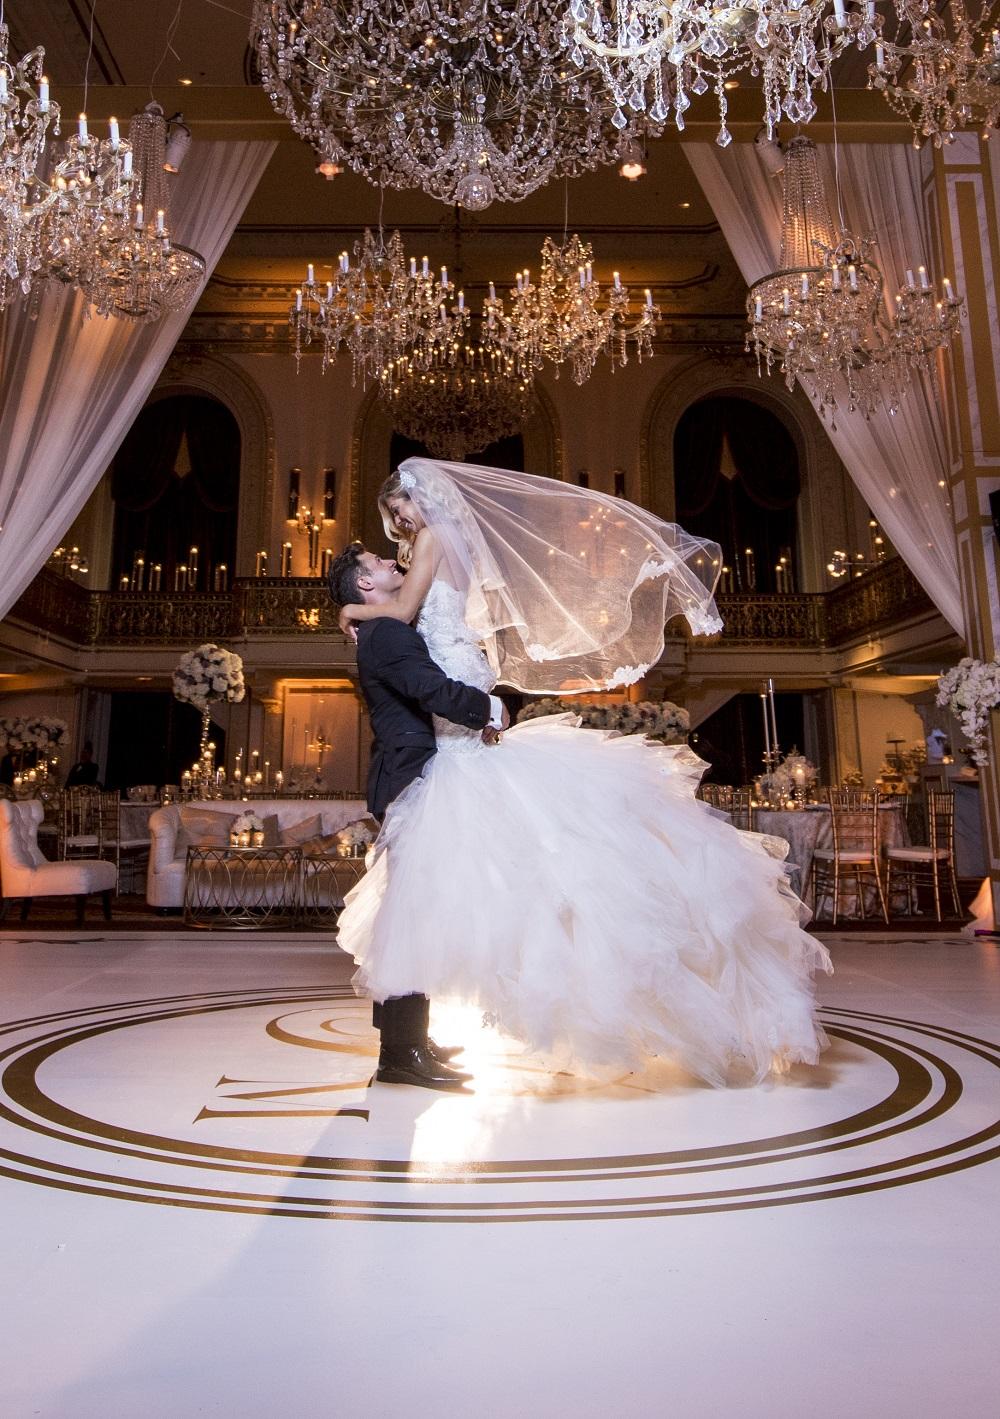 Groom carrying bride in ballroom